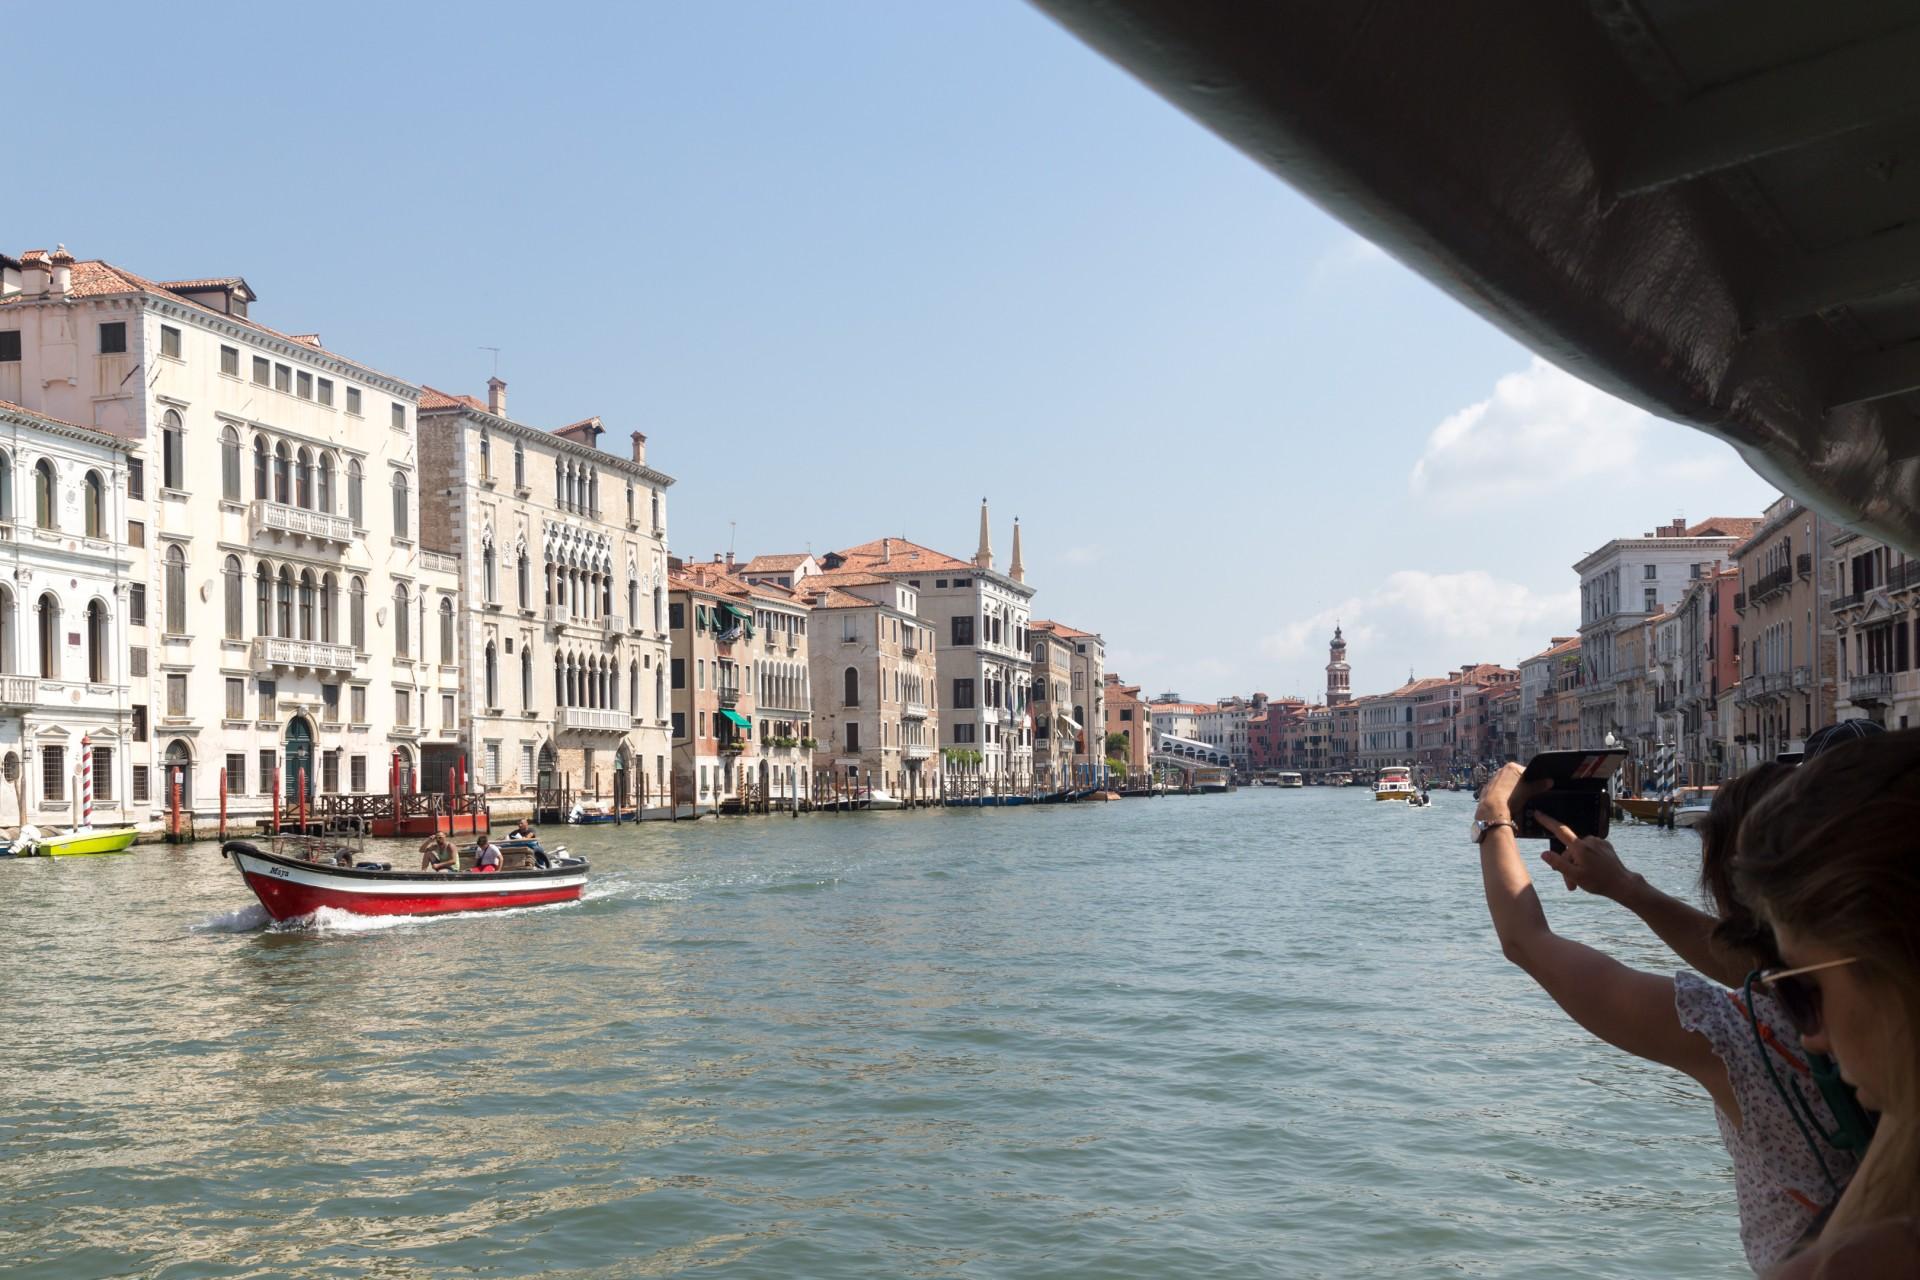 Stadtrundfahrt in Venedig per Vaporetto